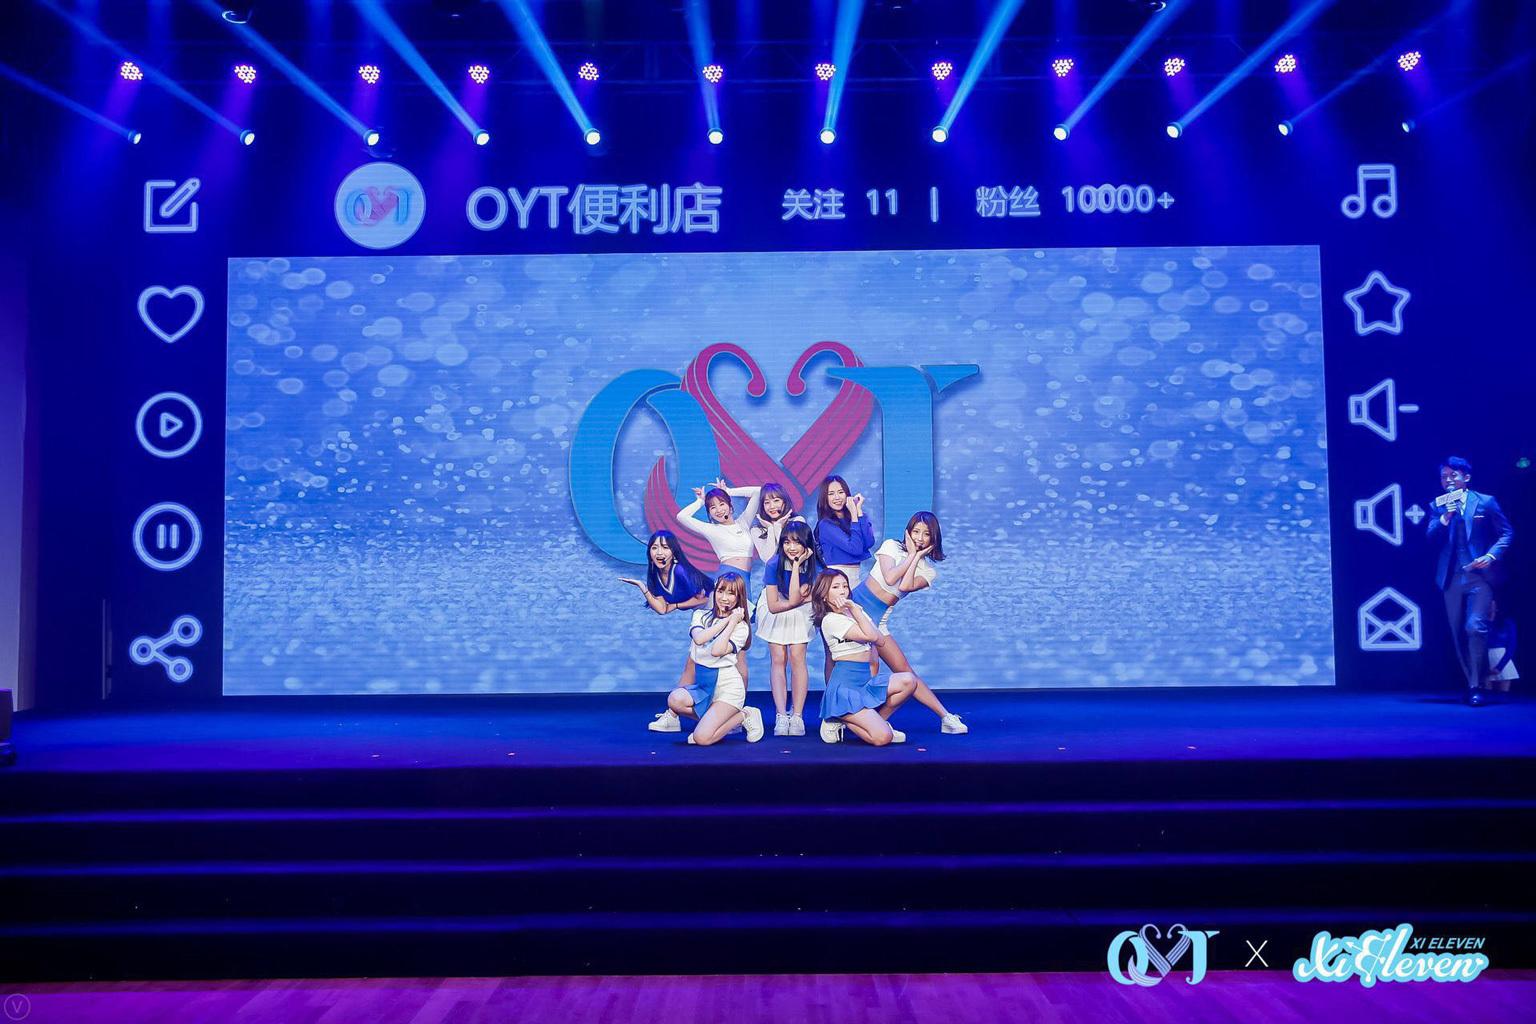 OYT女团首支单曲《噗通噗通》甜蜜上线